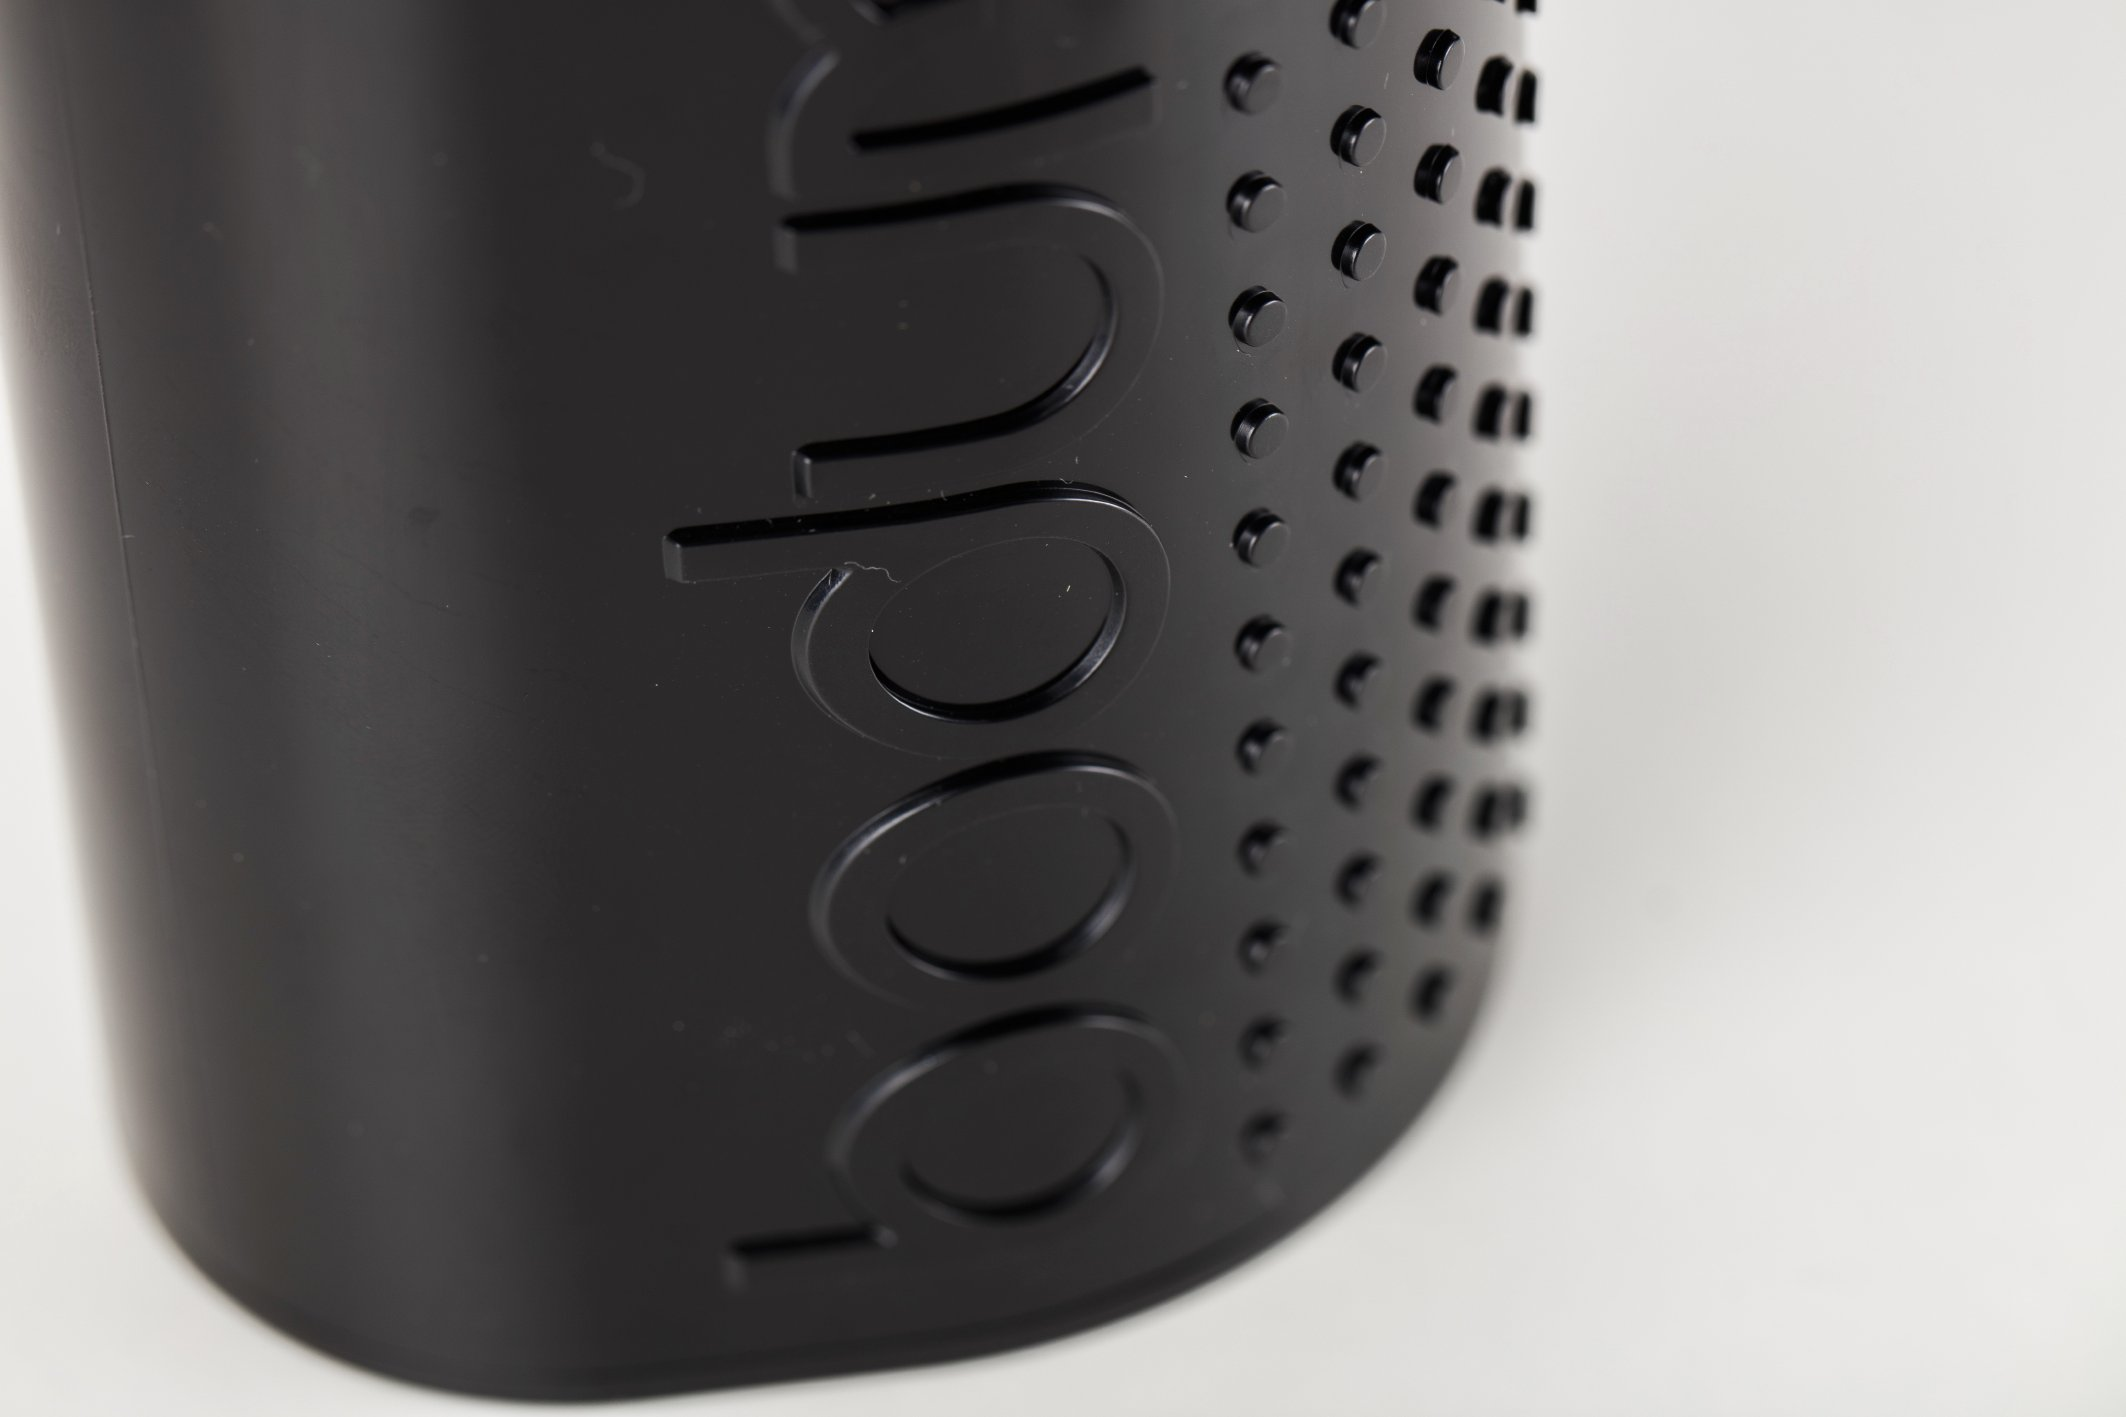 Bodum BISTRO Blade Grinder, Electric Blade Coffee Grinder, Black by Bodum (Image #8)